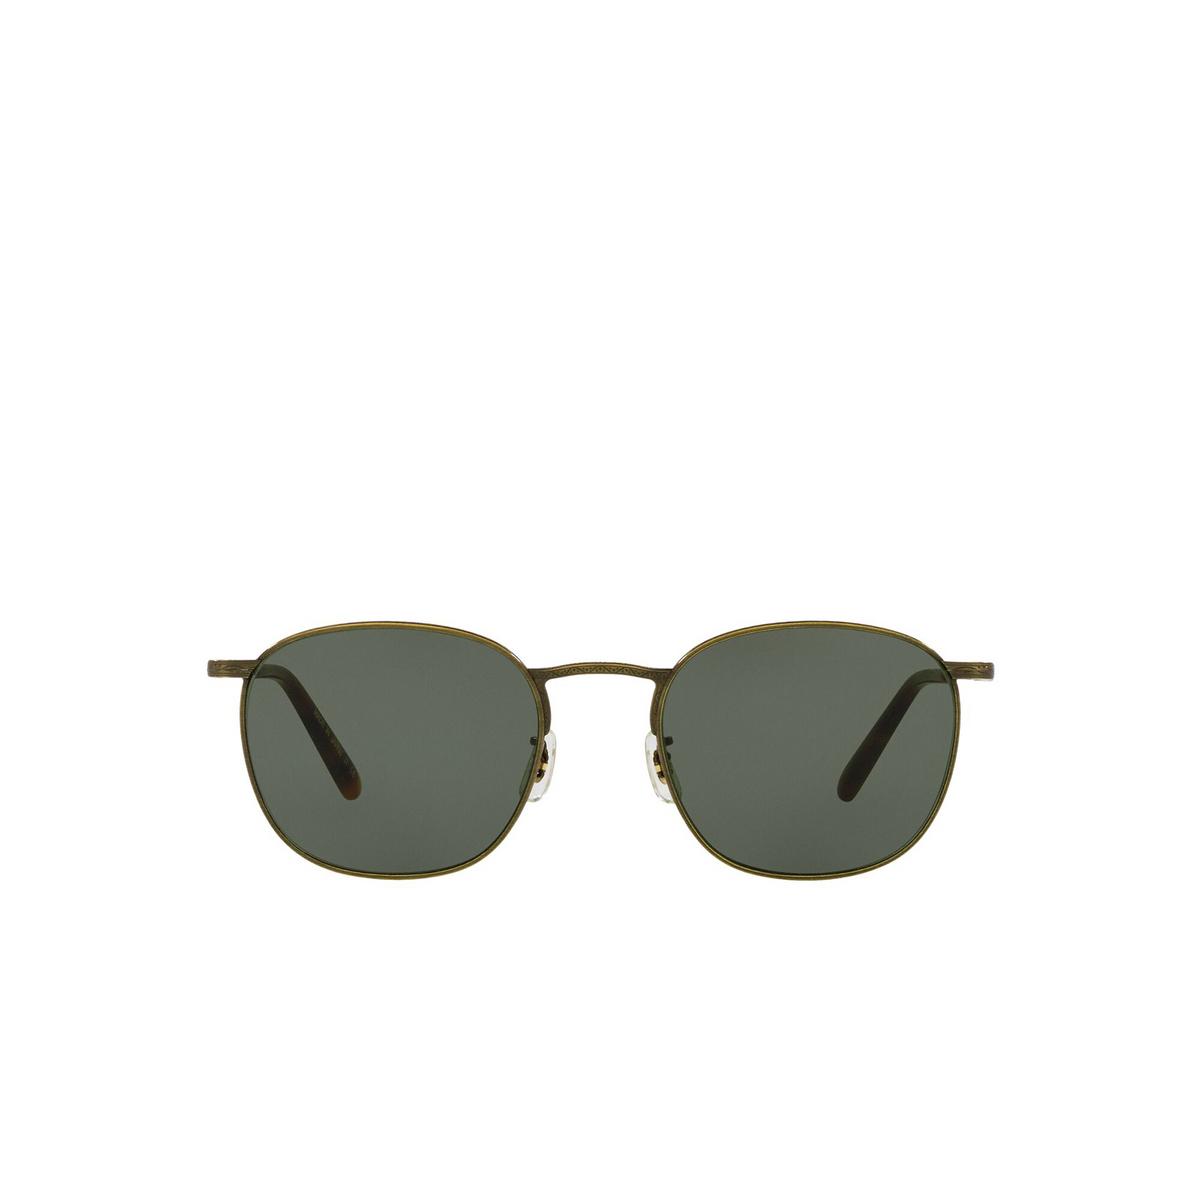 Oliver Peoples® Square Sunglasses: Goldsen Sun OV1285ST color Antique Gold 528452 - front view.